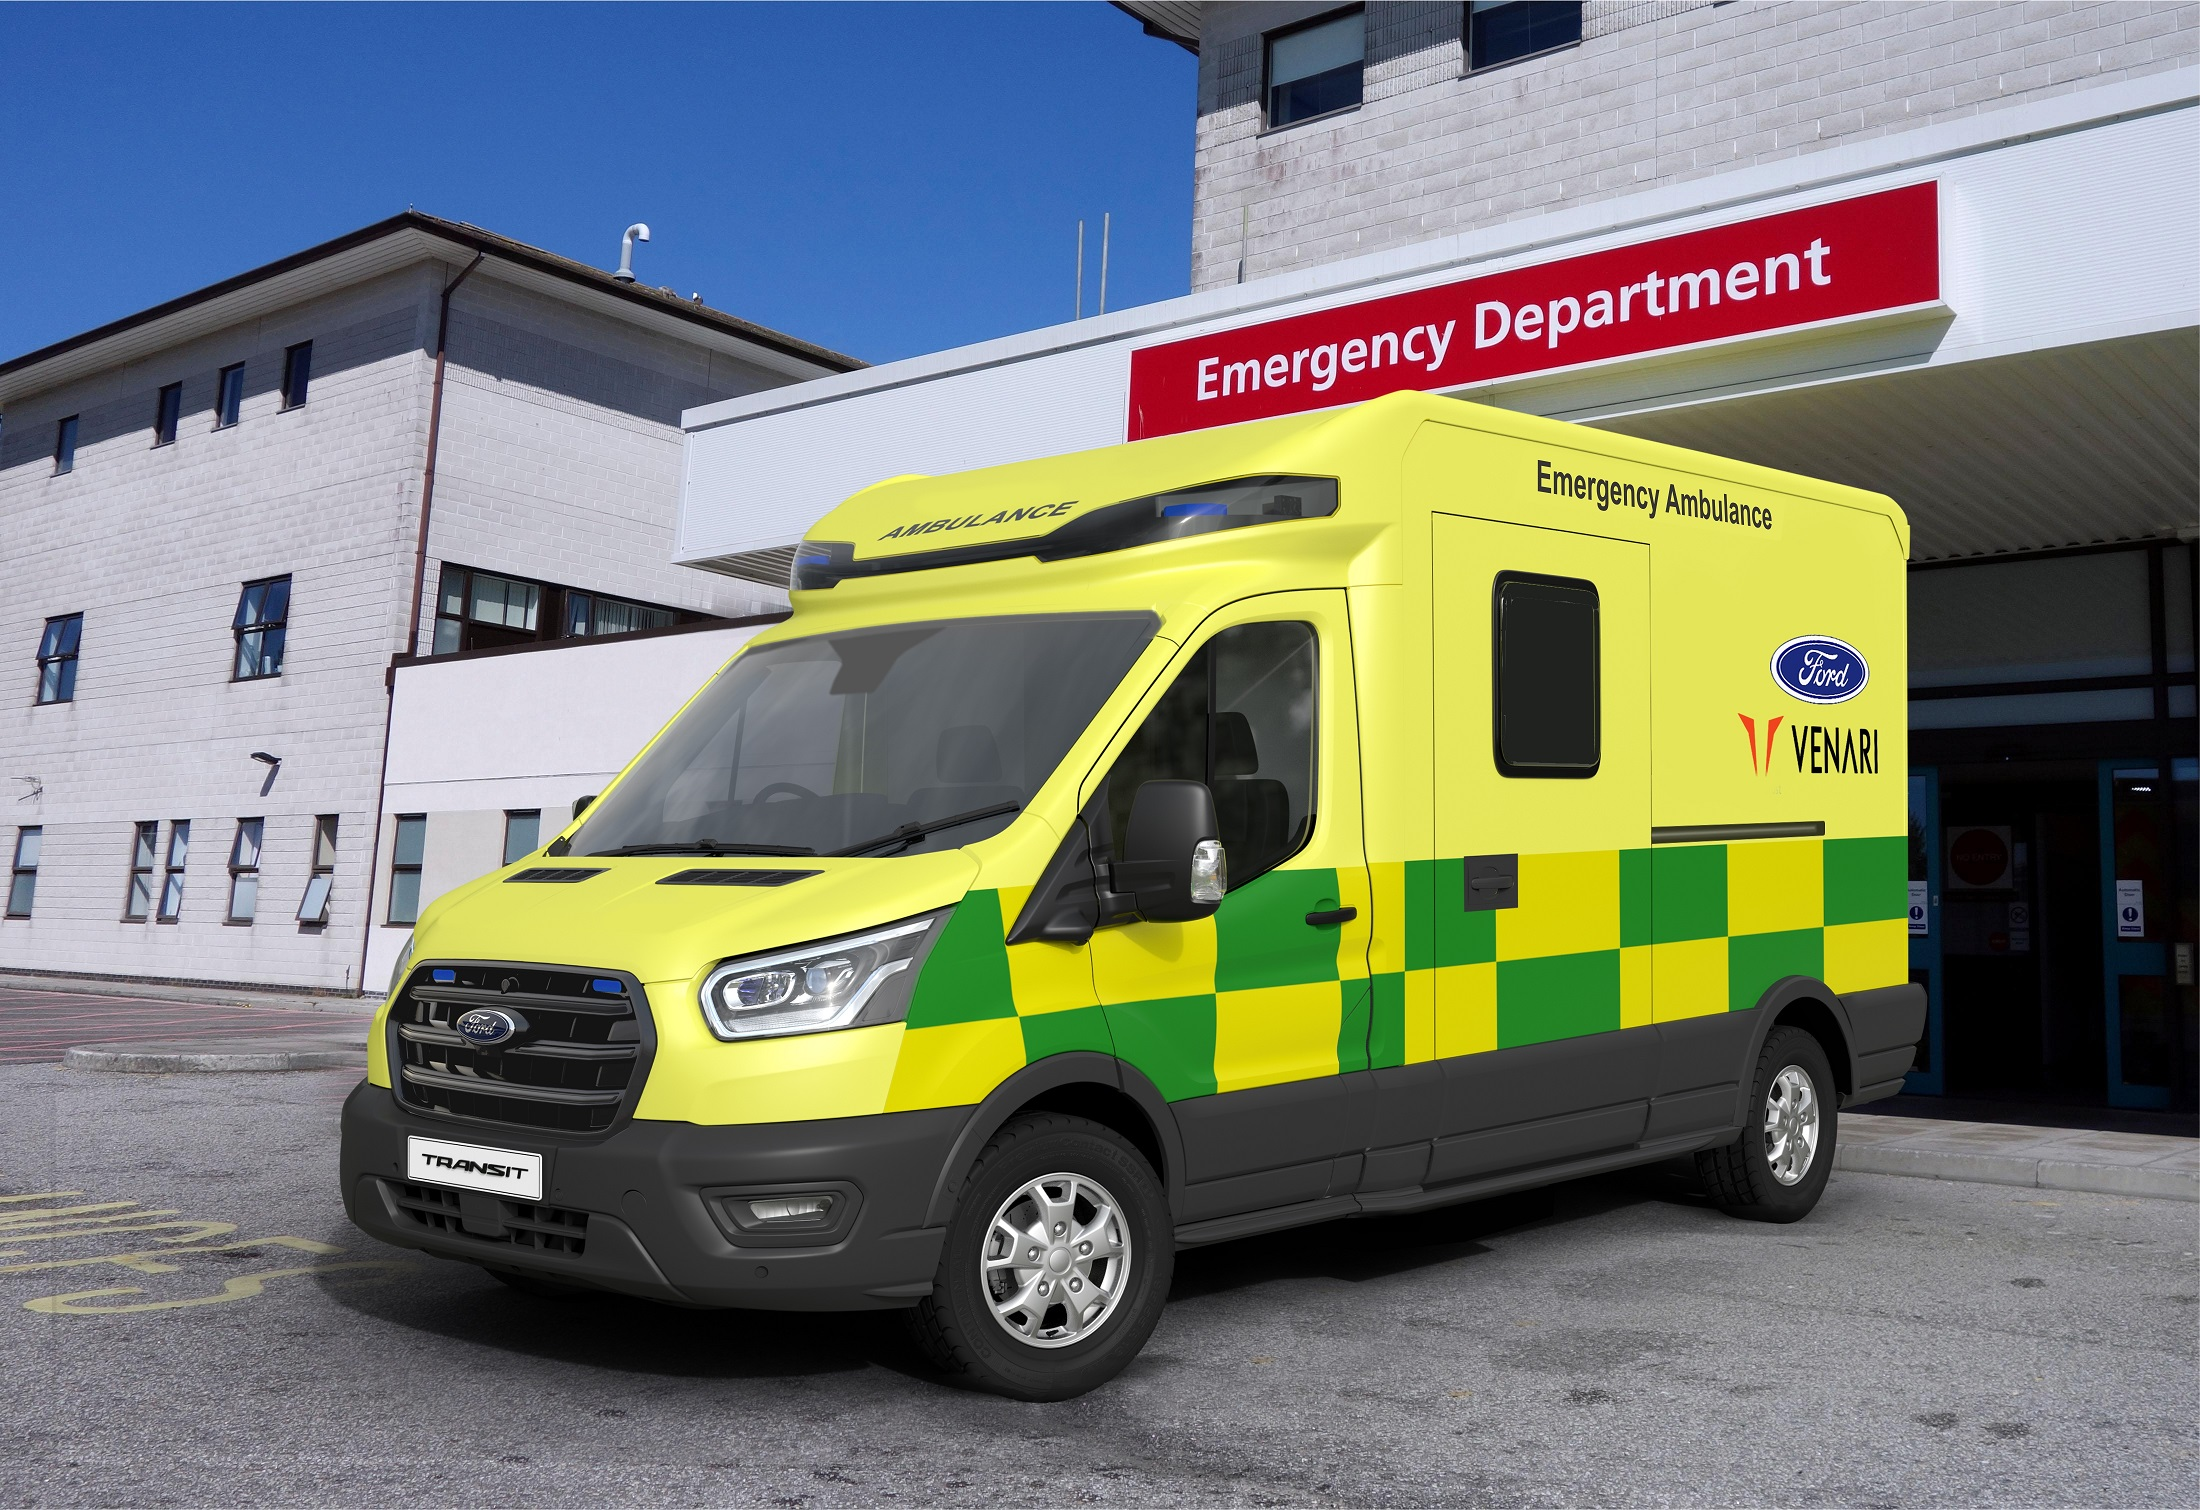 Ford Venari Project Siren Ambulance